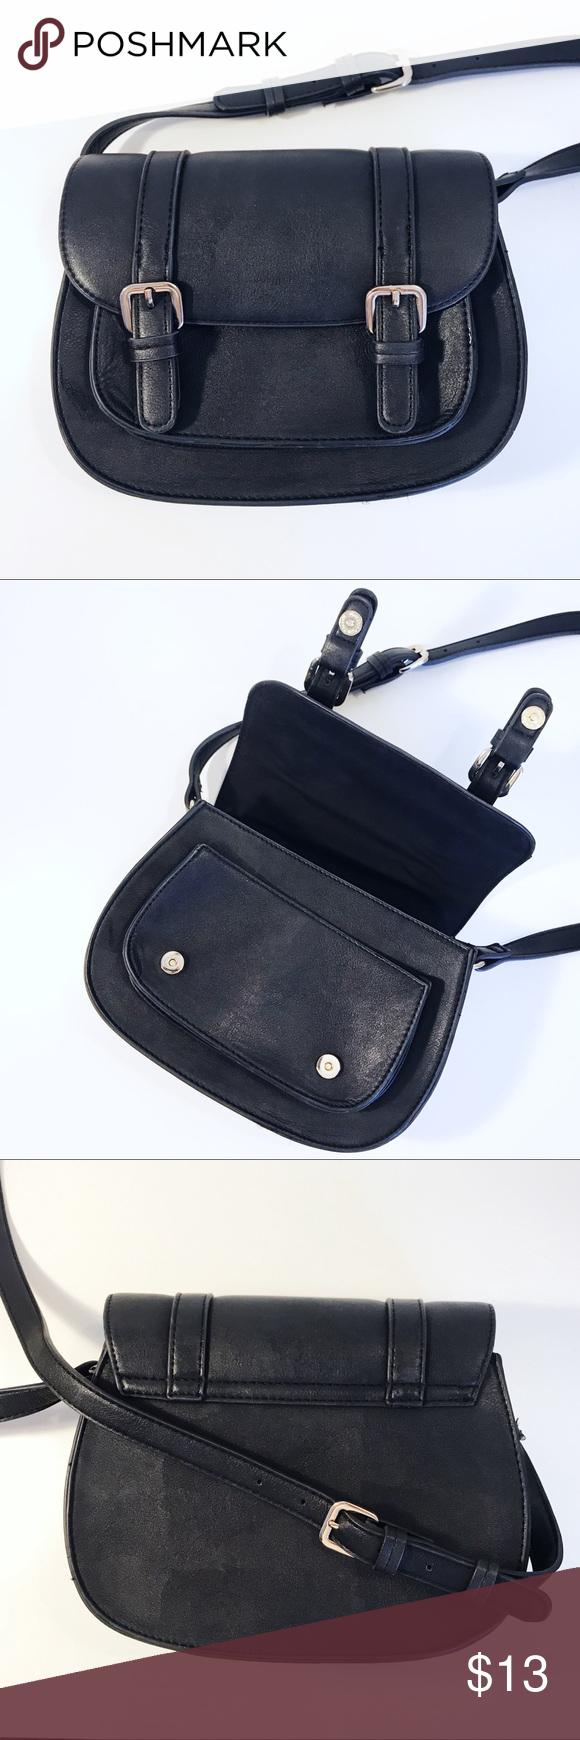 F21 Cross Body Black Saddle Bag W/Adjustable Strap | Black saddle bag. Leather saddle bags. Bags